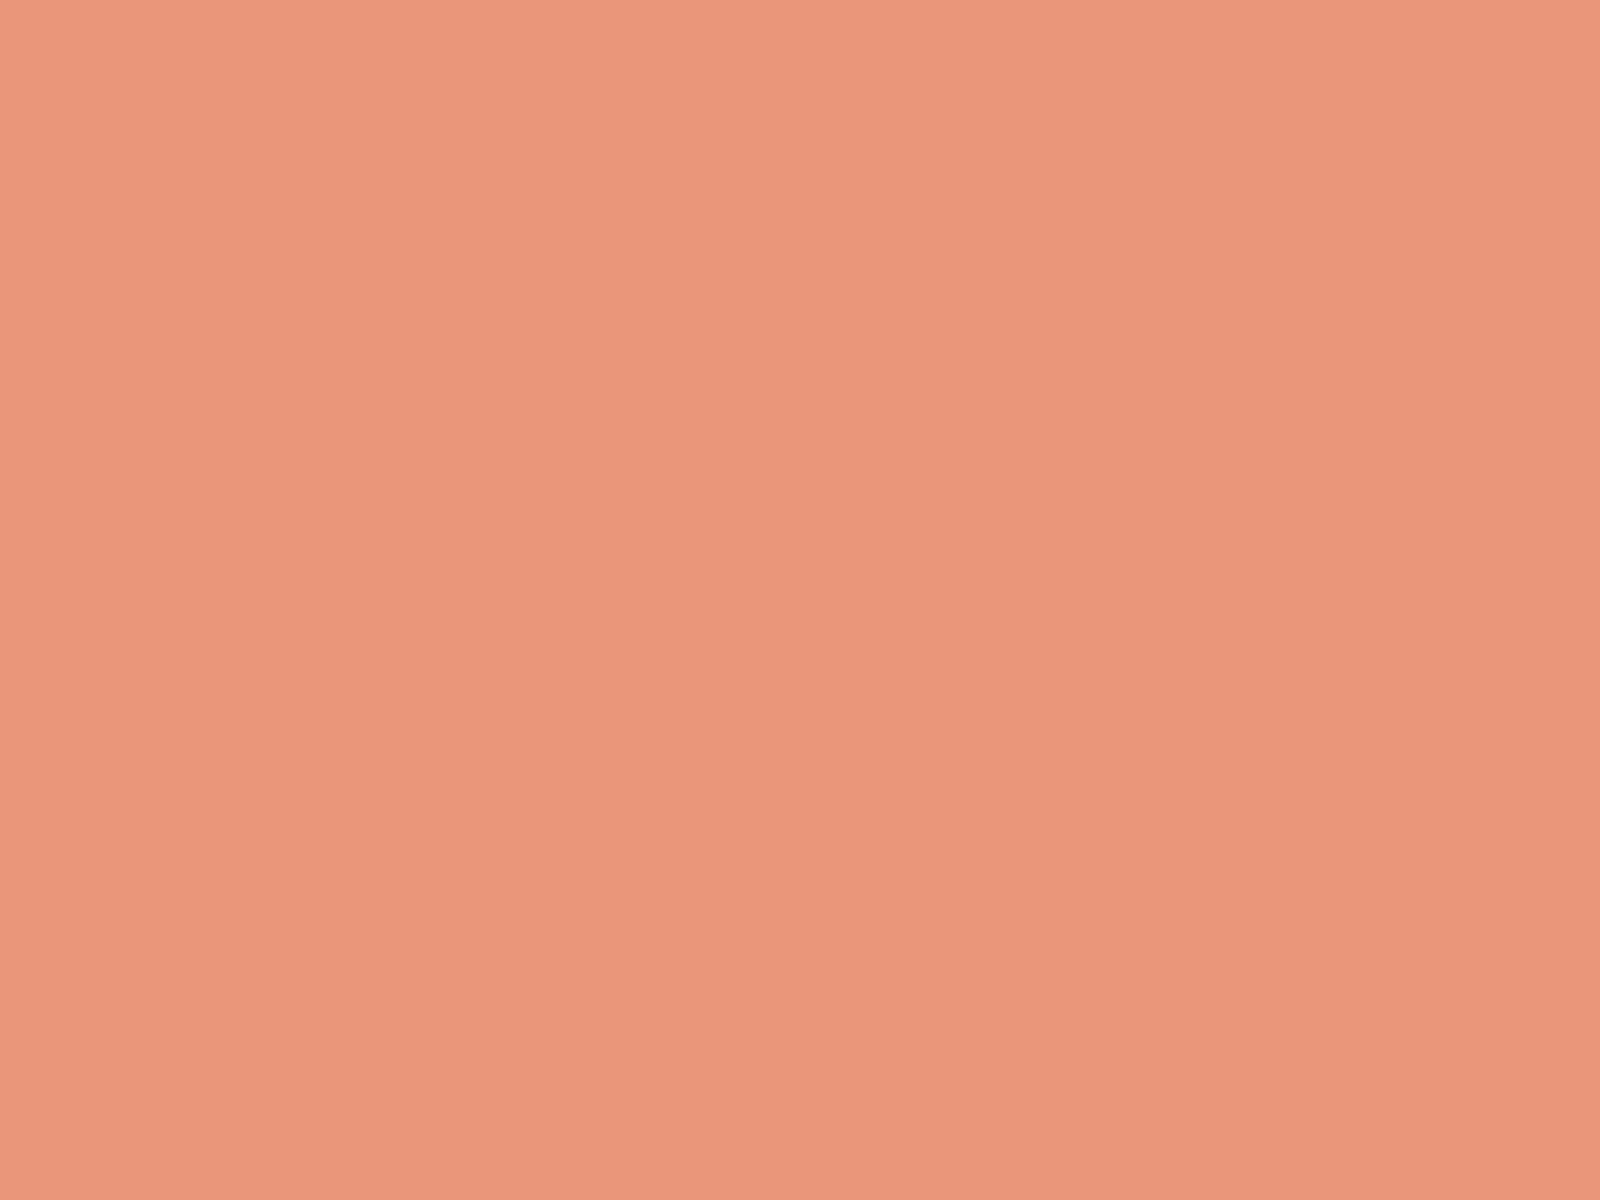 1600x1200 Dark Salmon Solid Color Background